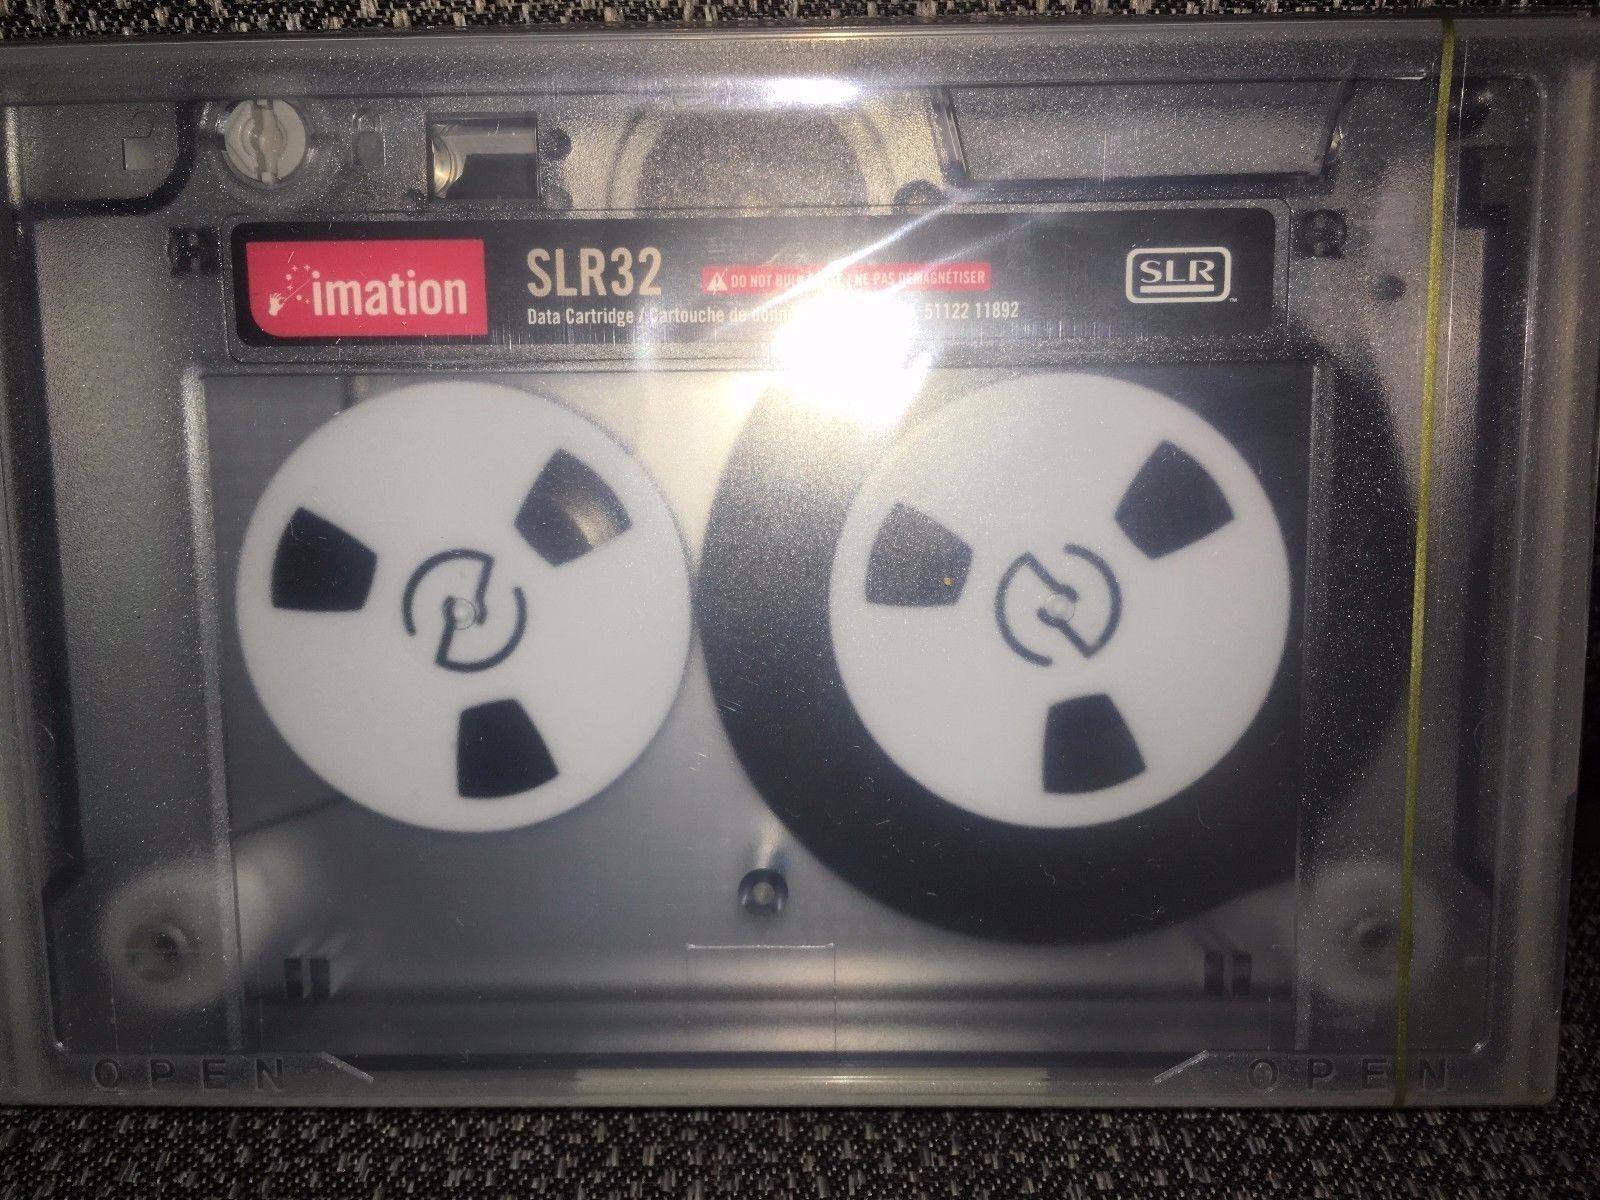 New Imation SLR32 16GB//32GB Data Tape Cartridge 11892  super fast shipping NEW